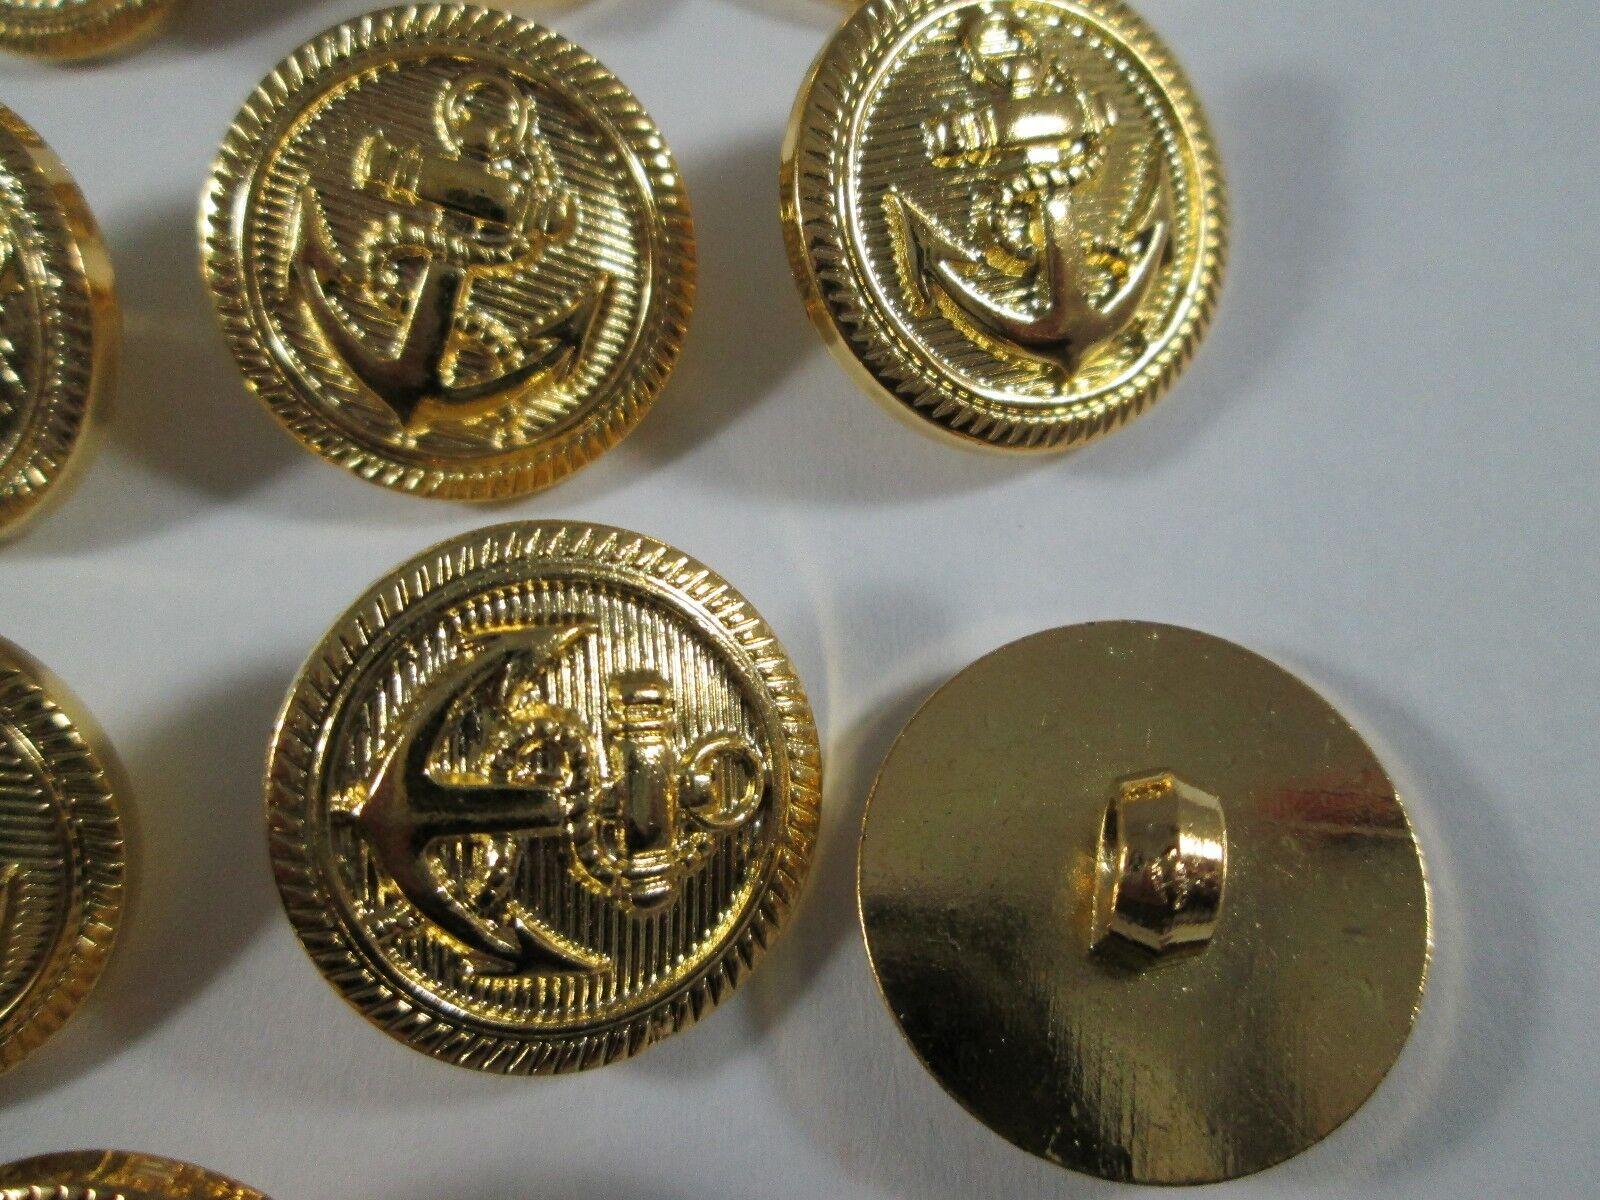 10 Stück gold Metall Knöpfe marine maritim Ösenknöpfe 13mm